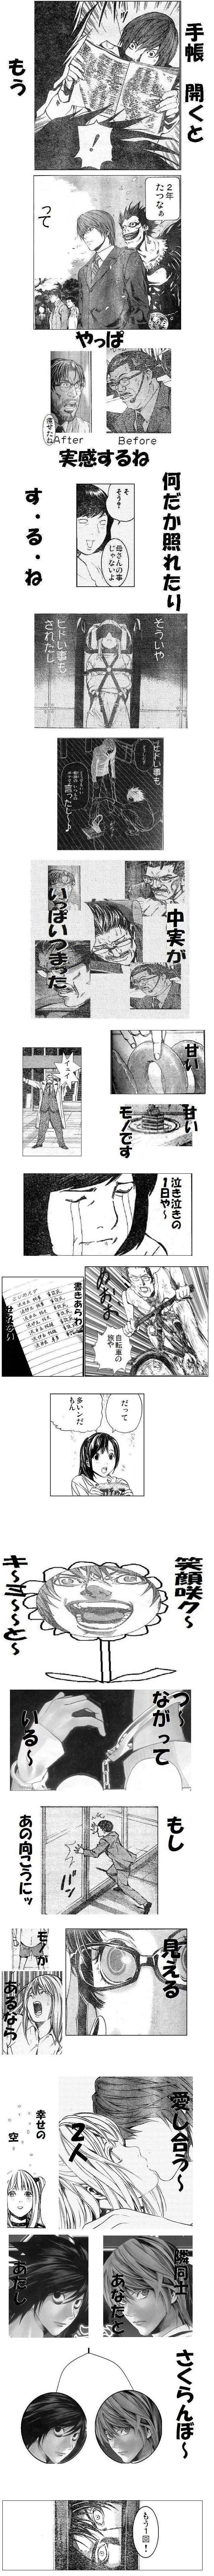 sakuranbo-deathnote